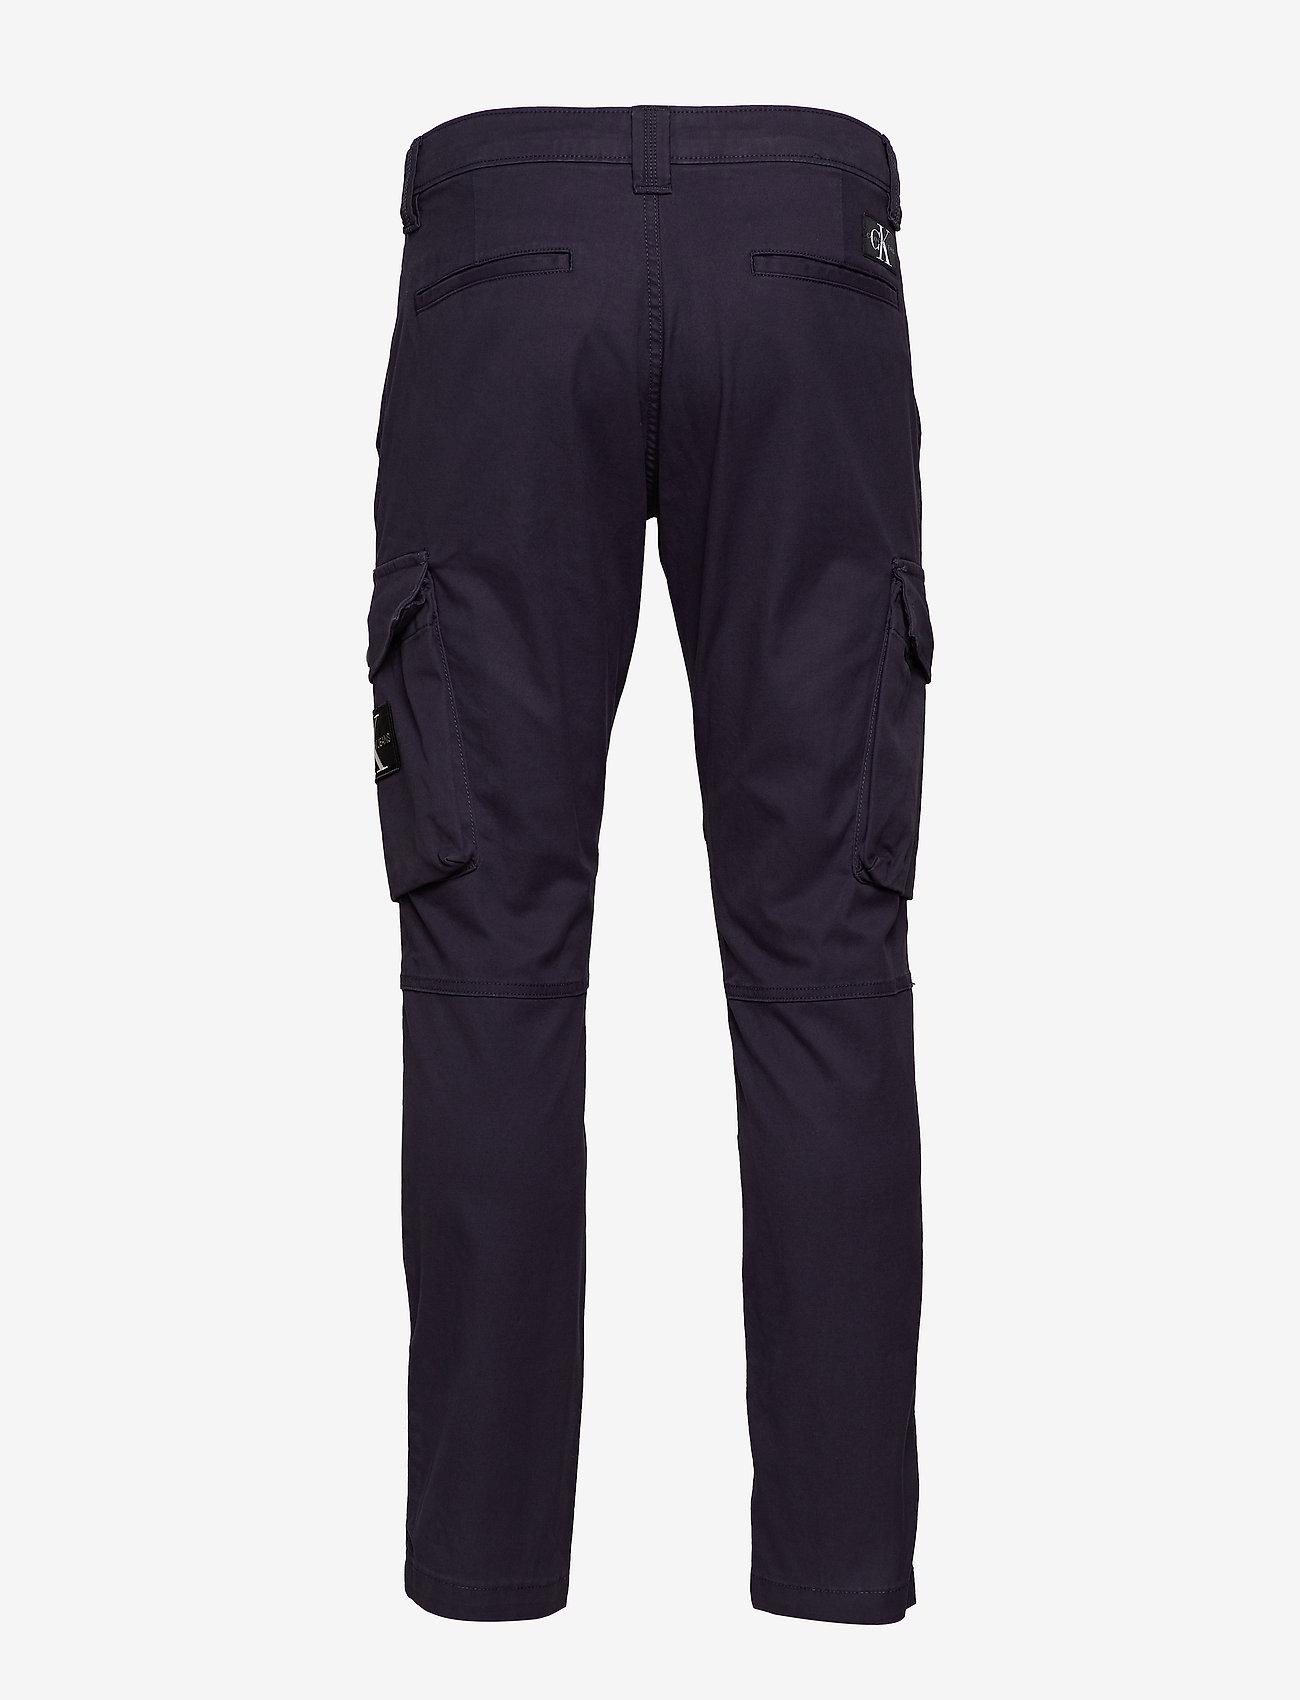 Calvin Klein Jeans - SKINNY WASHED CARGO PANT - bojówki - night sky - 1